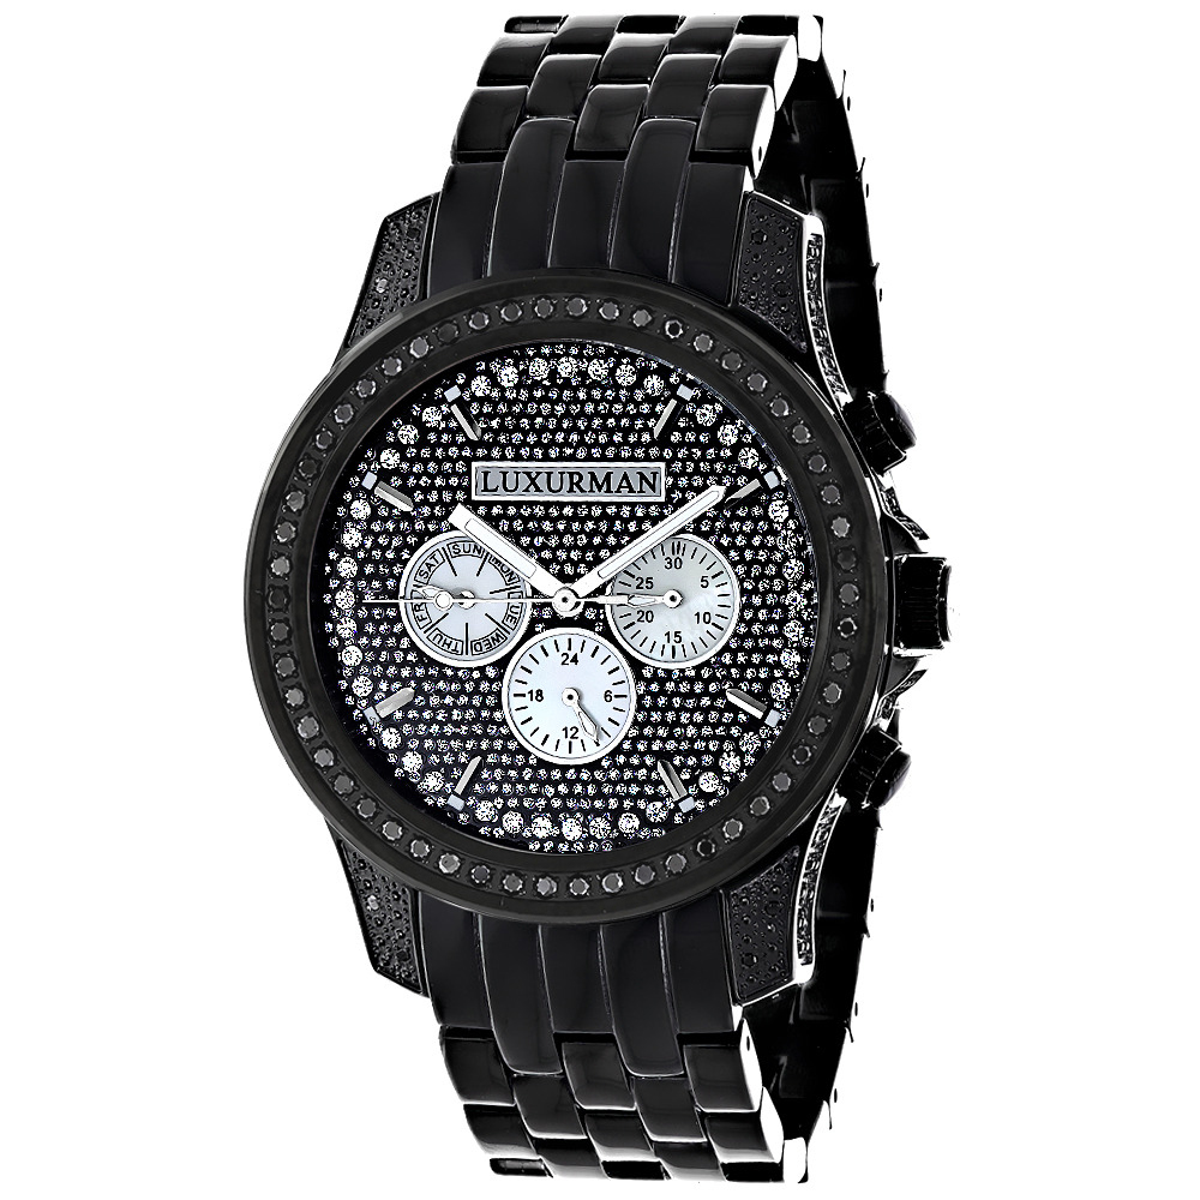 Mens Black Diamond Watch  LUXURMAN Designer Watches 2.5 carats